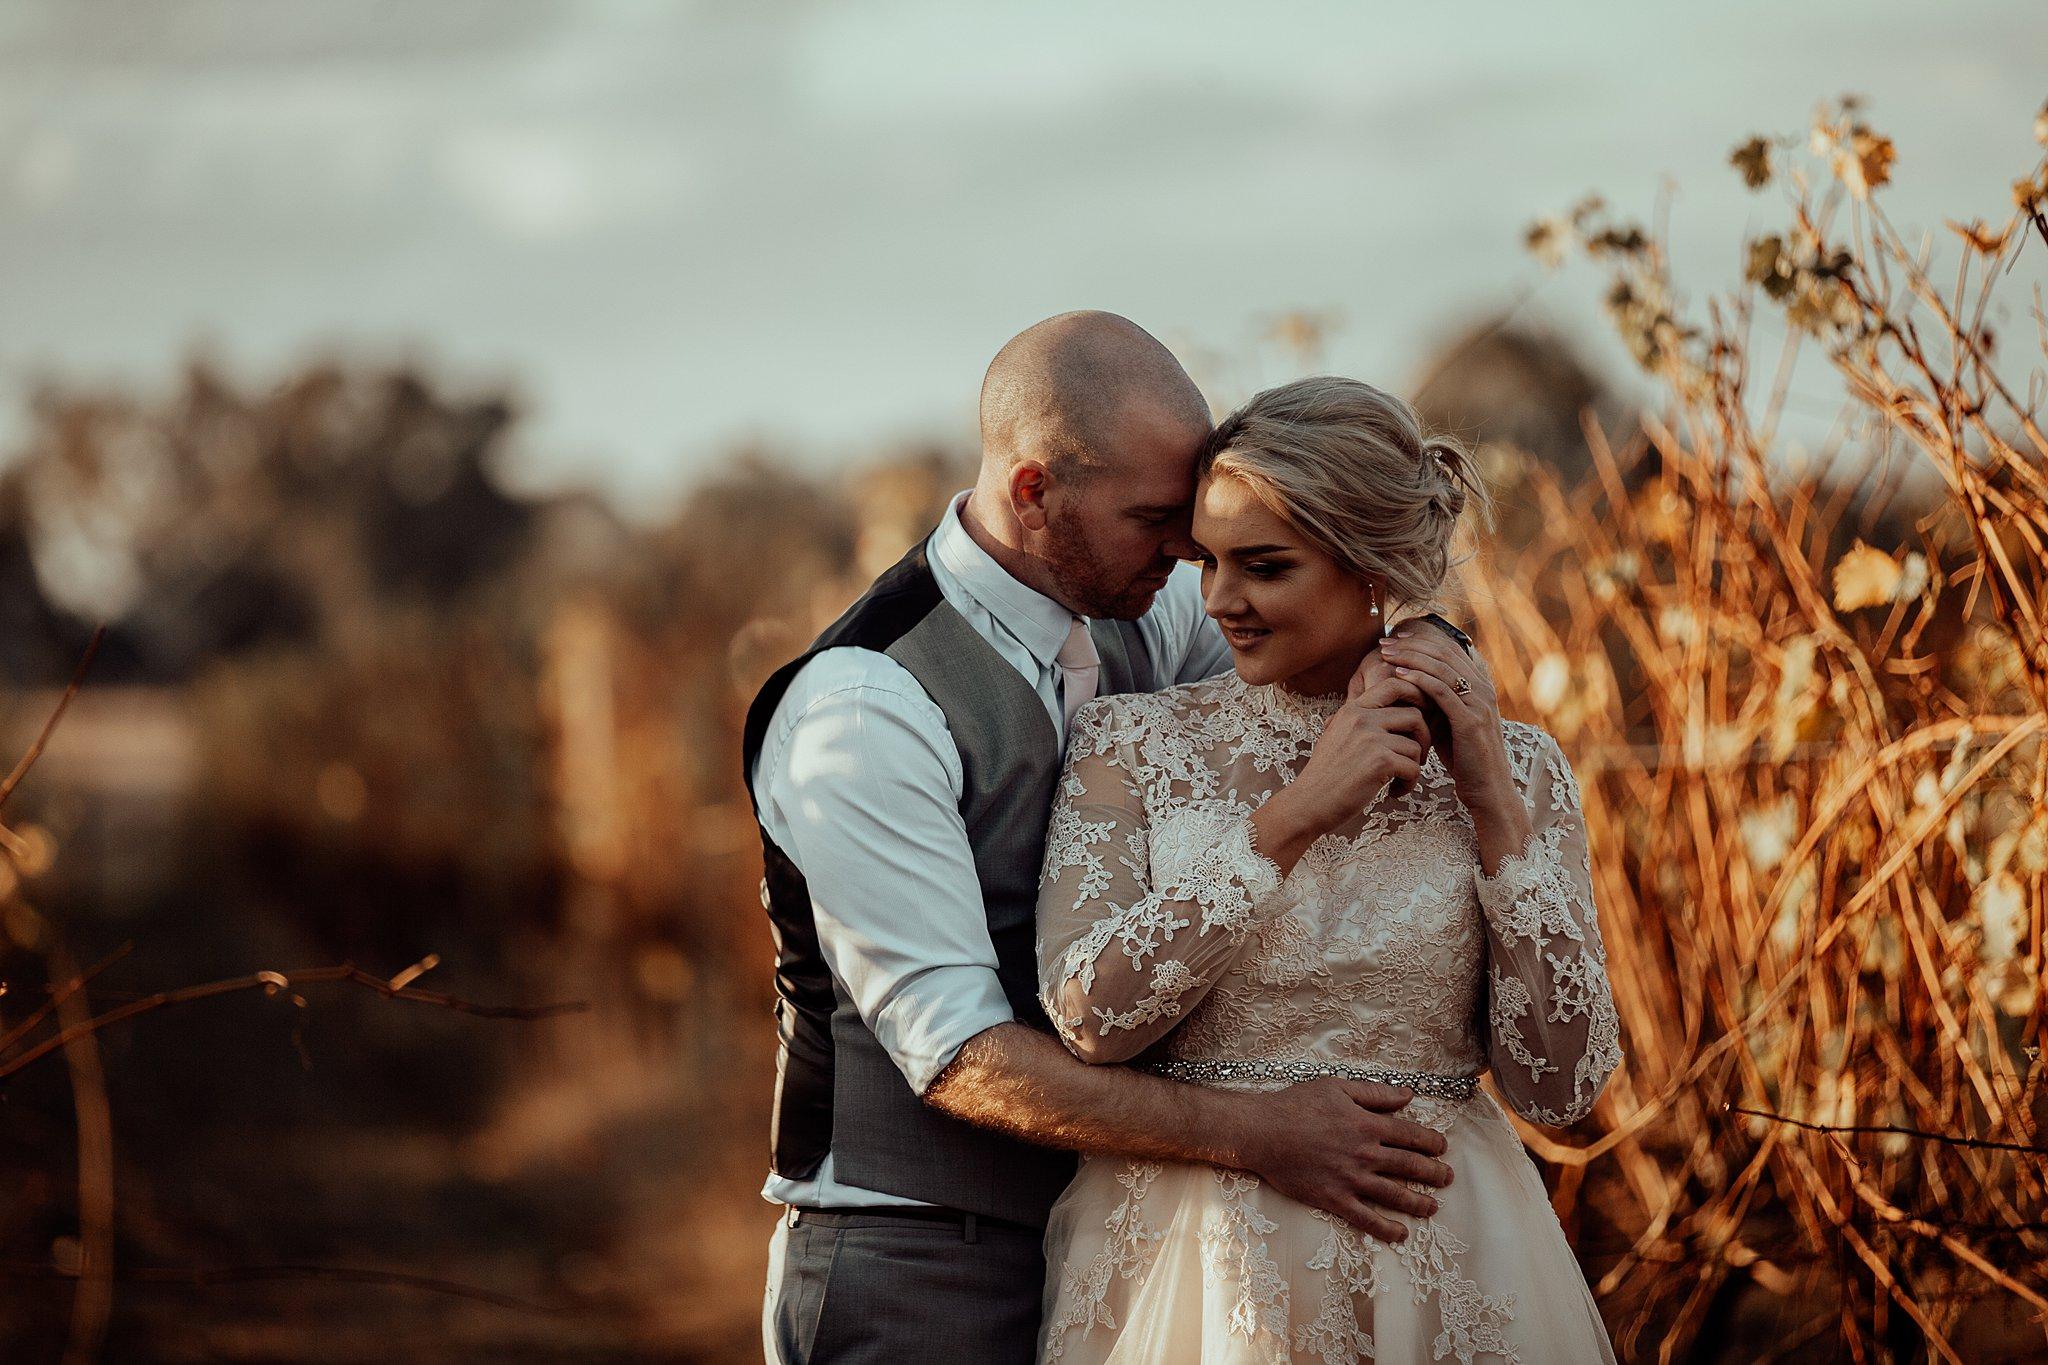 mickalathomas_puremacphotography_weddingphotographer_couplephotographer_Sheppartonphotographer_3470.jpg